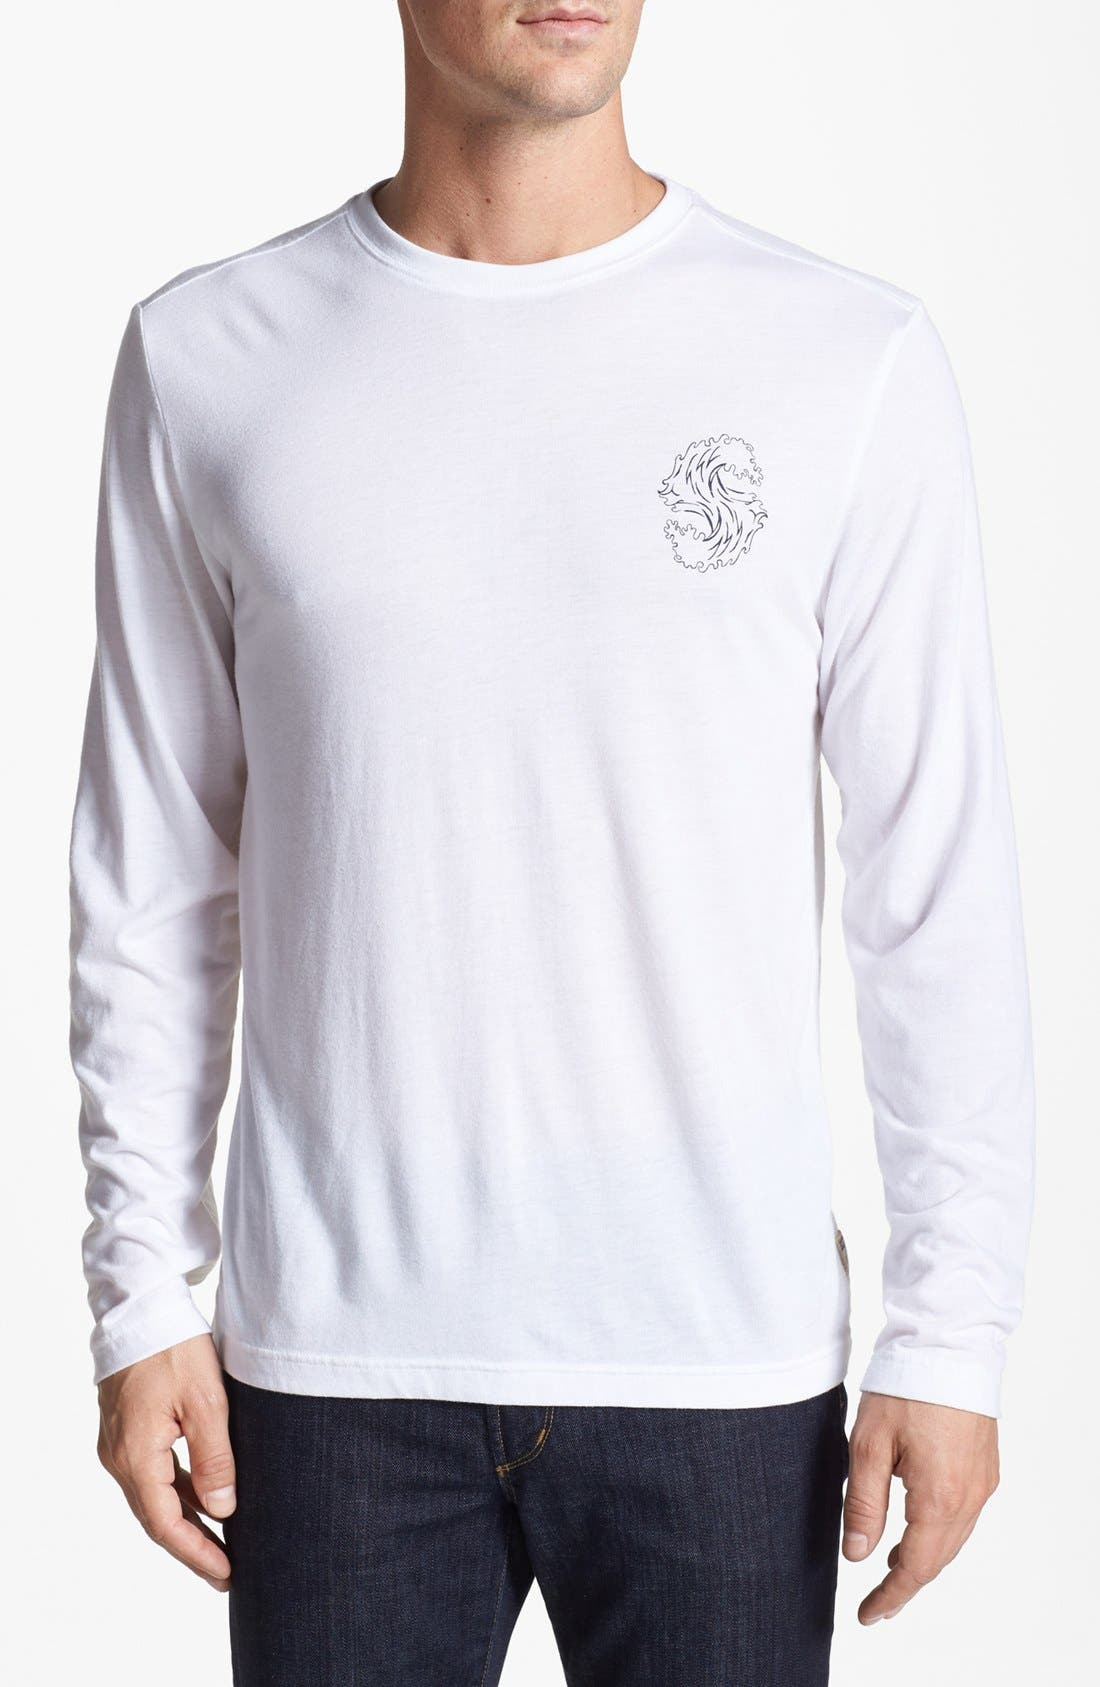 Alternate Image 1 Selected - Surfside Supply 'Tony' Long Sleeve T-Shirt